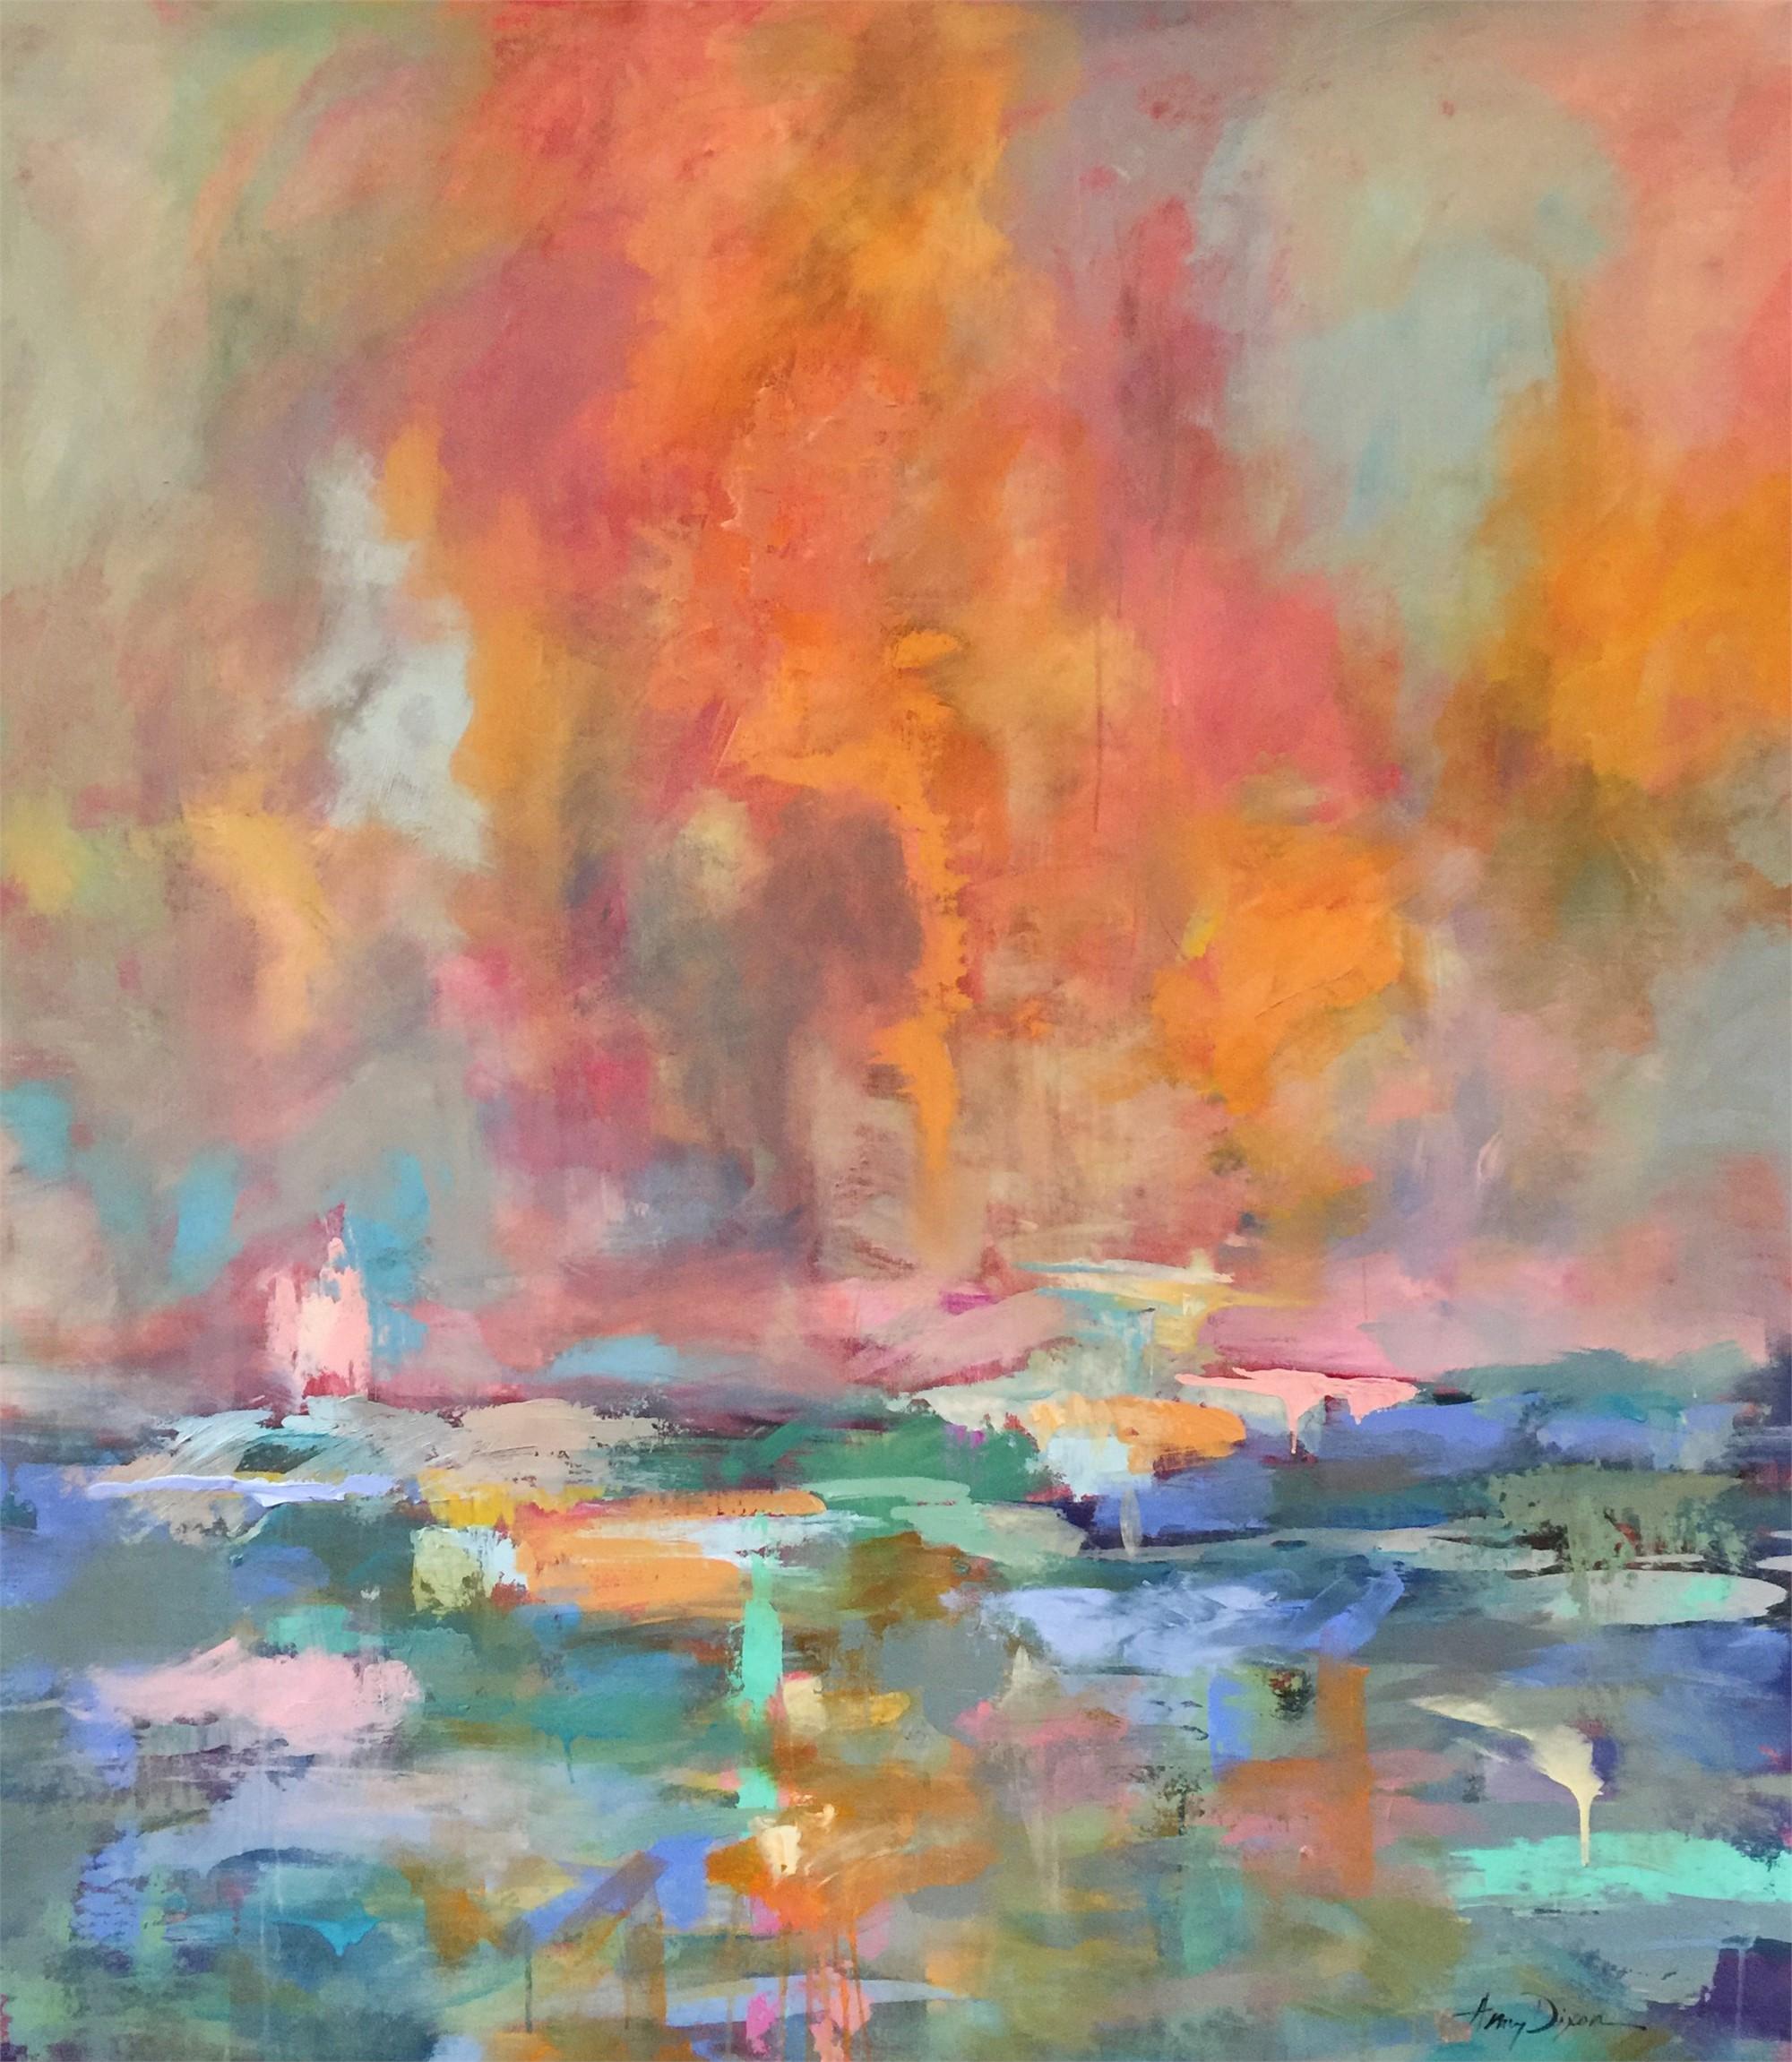 Walking on Sunshine by Amy Dixon